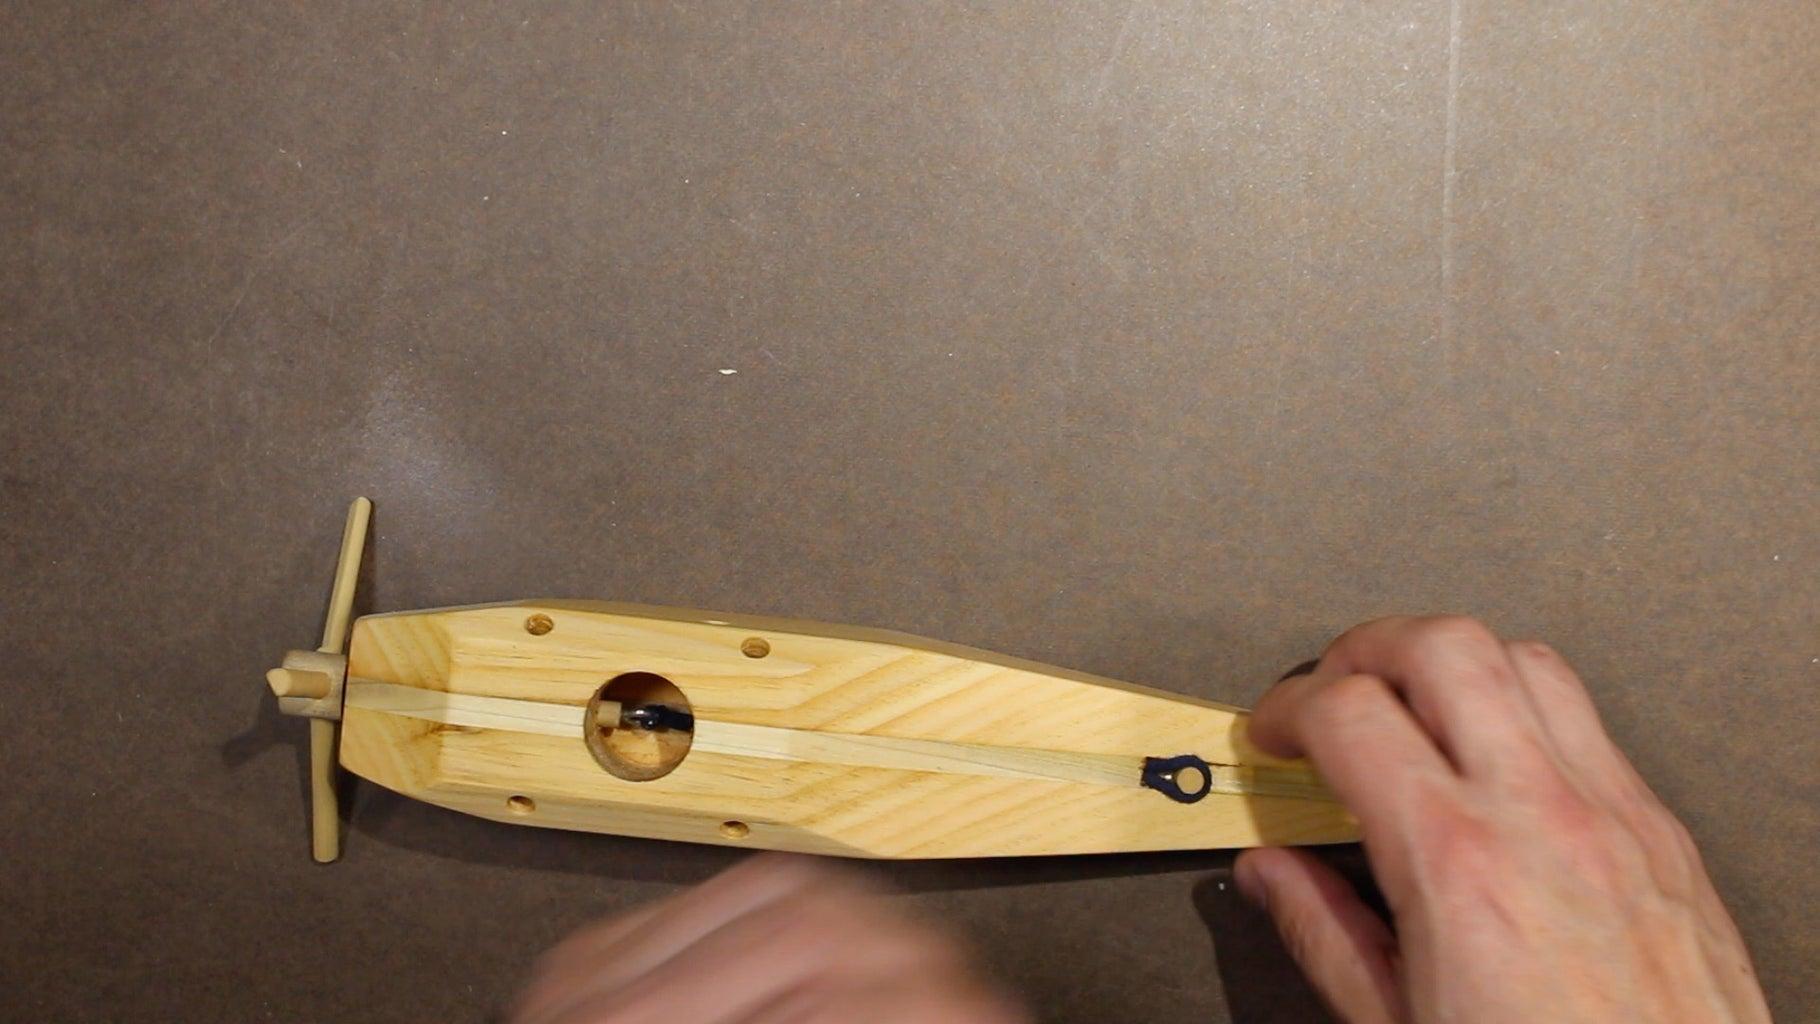 The Spinning Propeller